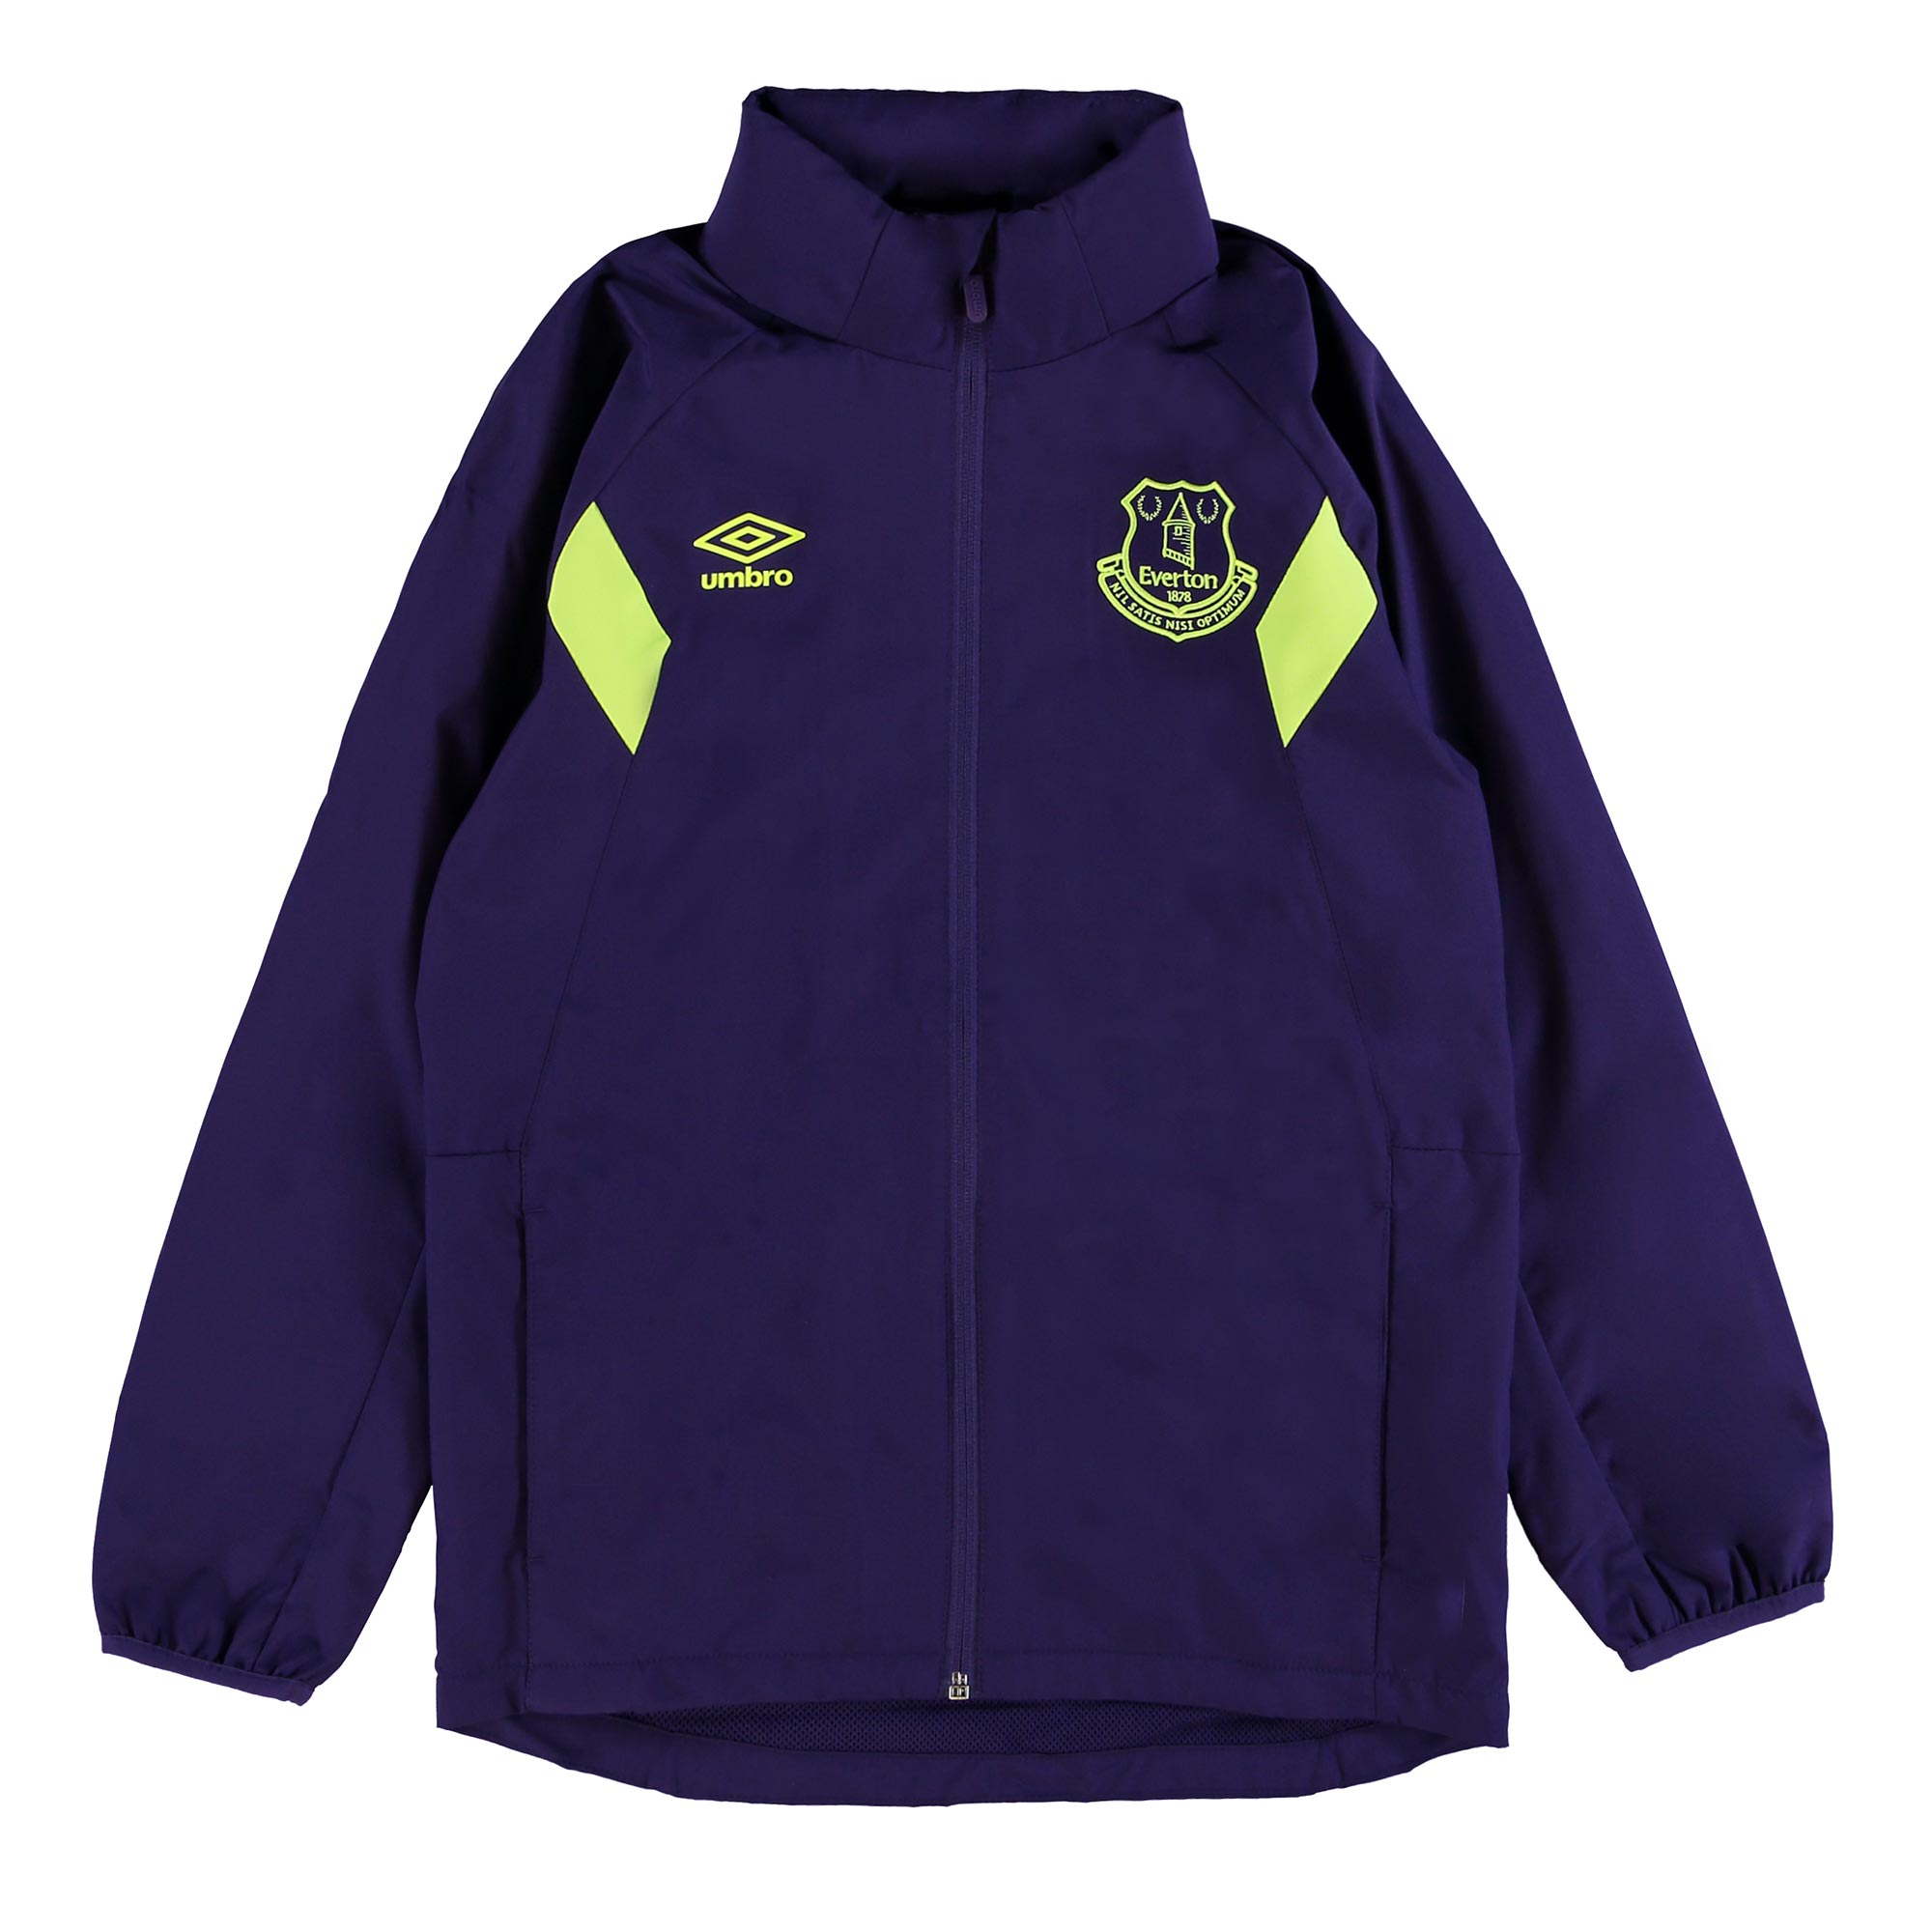 Everton Training Shower Jacket - Junior - Parachute Purple/Safety Yell